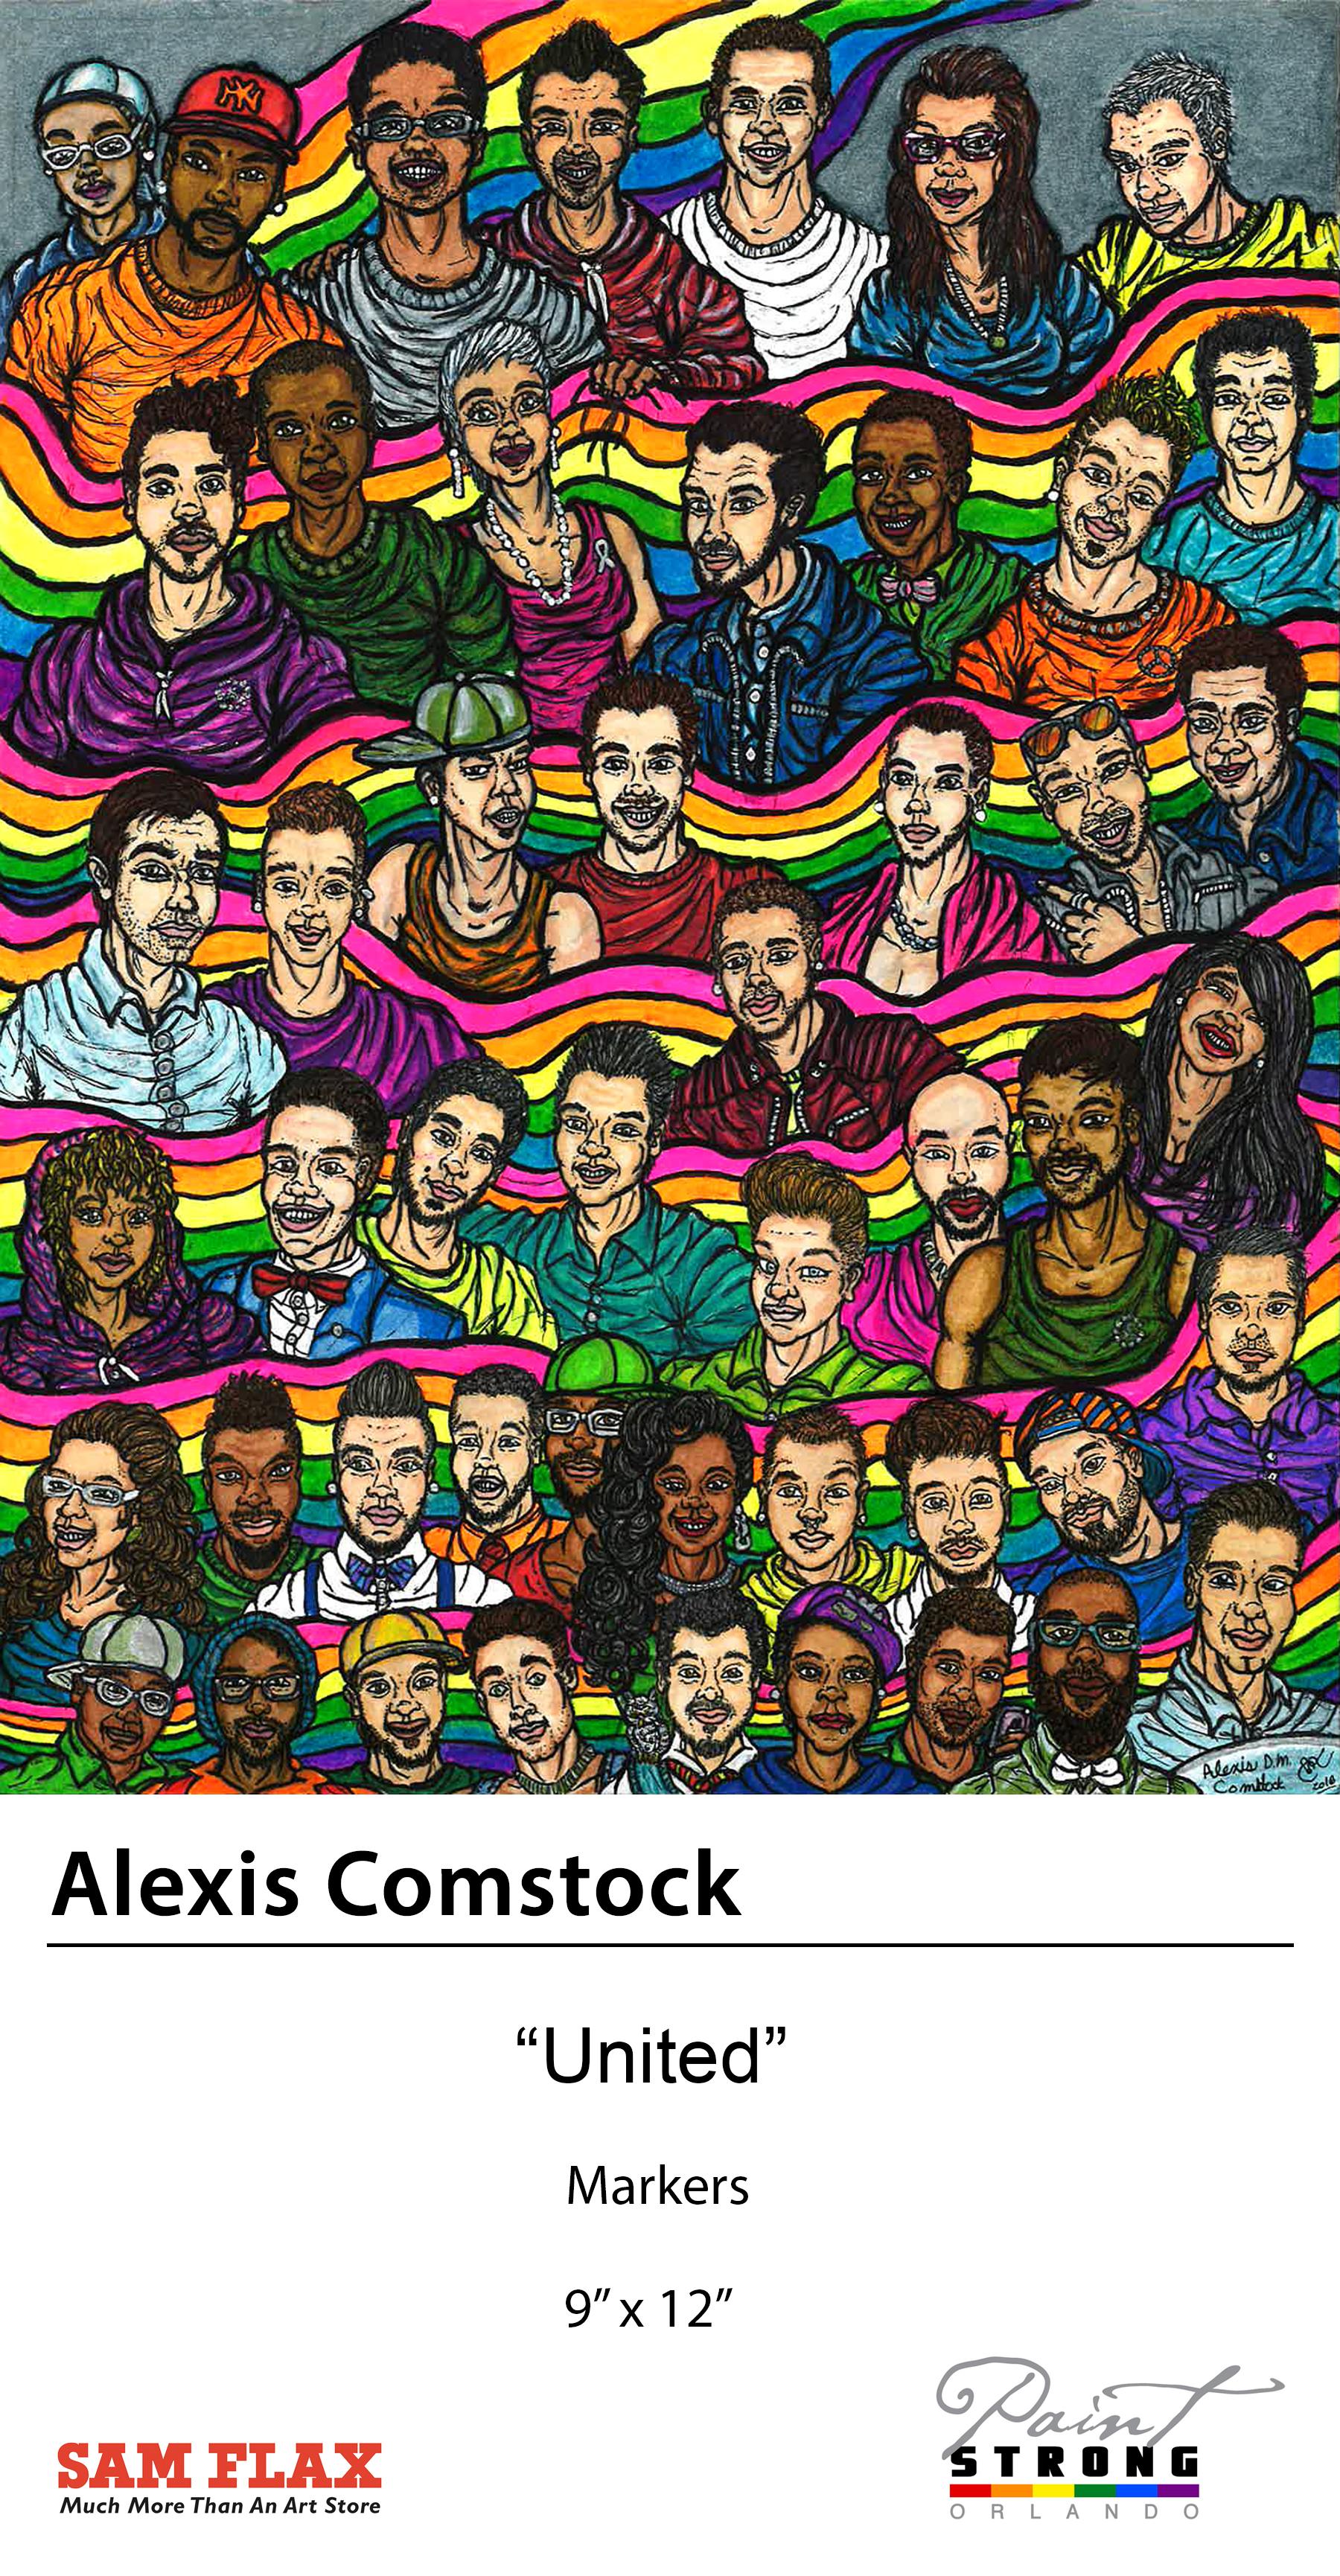 Alexis Comstock